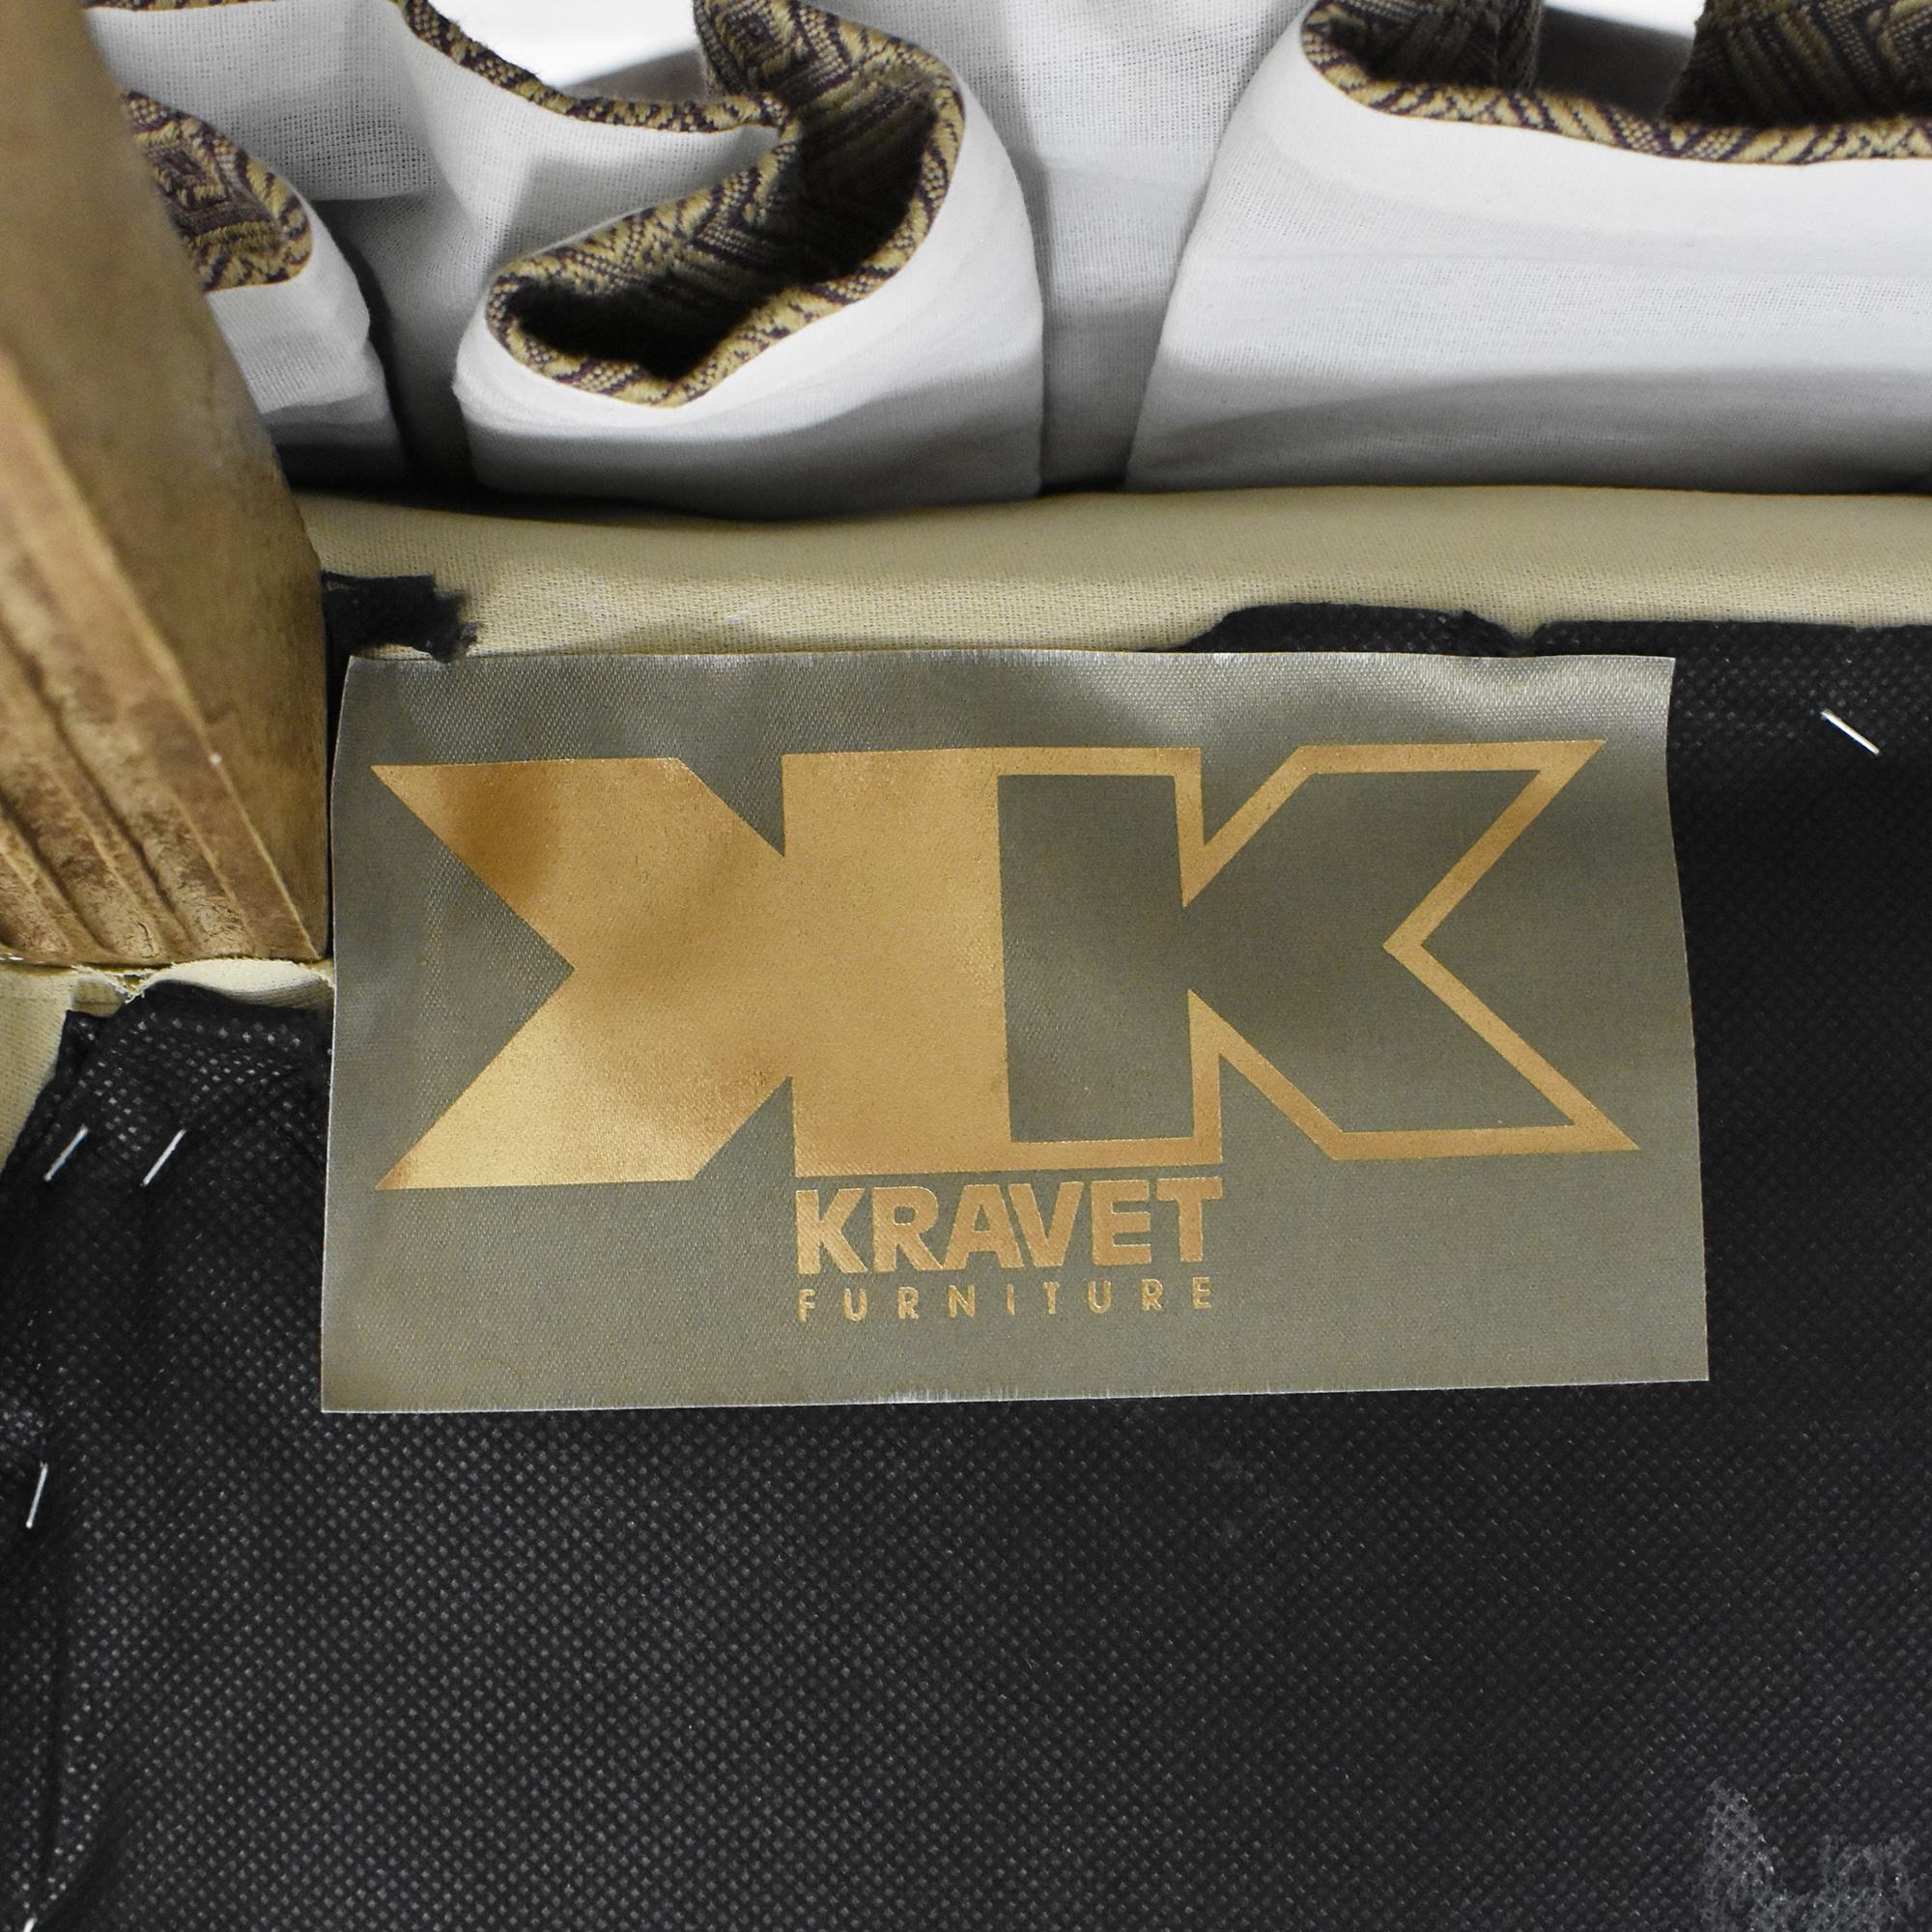 Kravet Kravet Pleated Accent Chair coupon